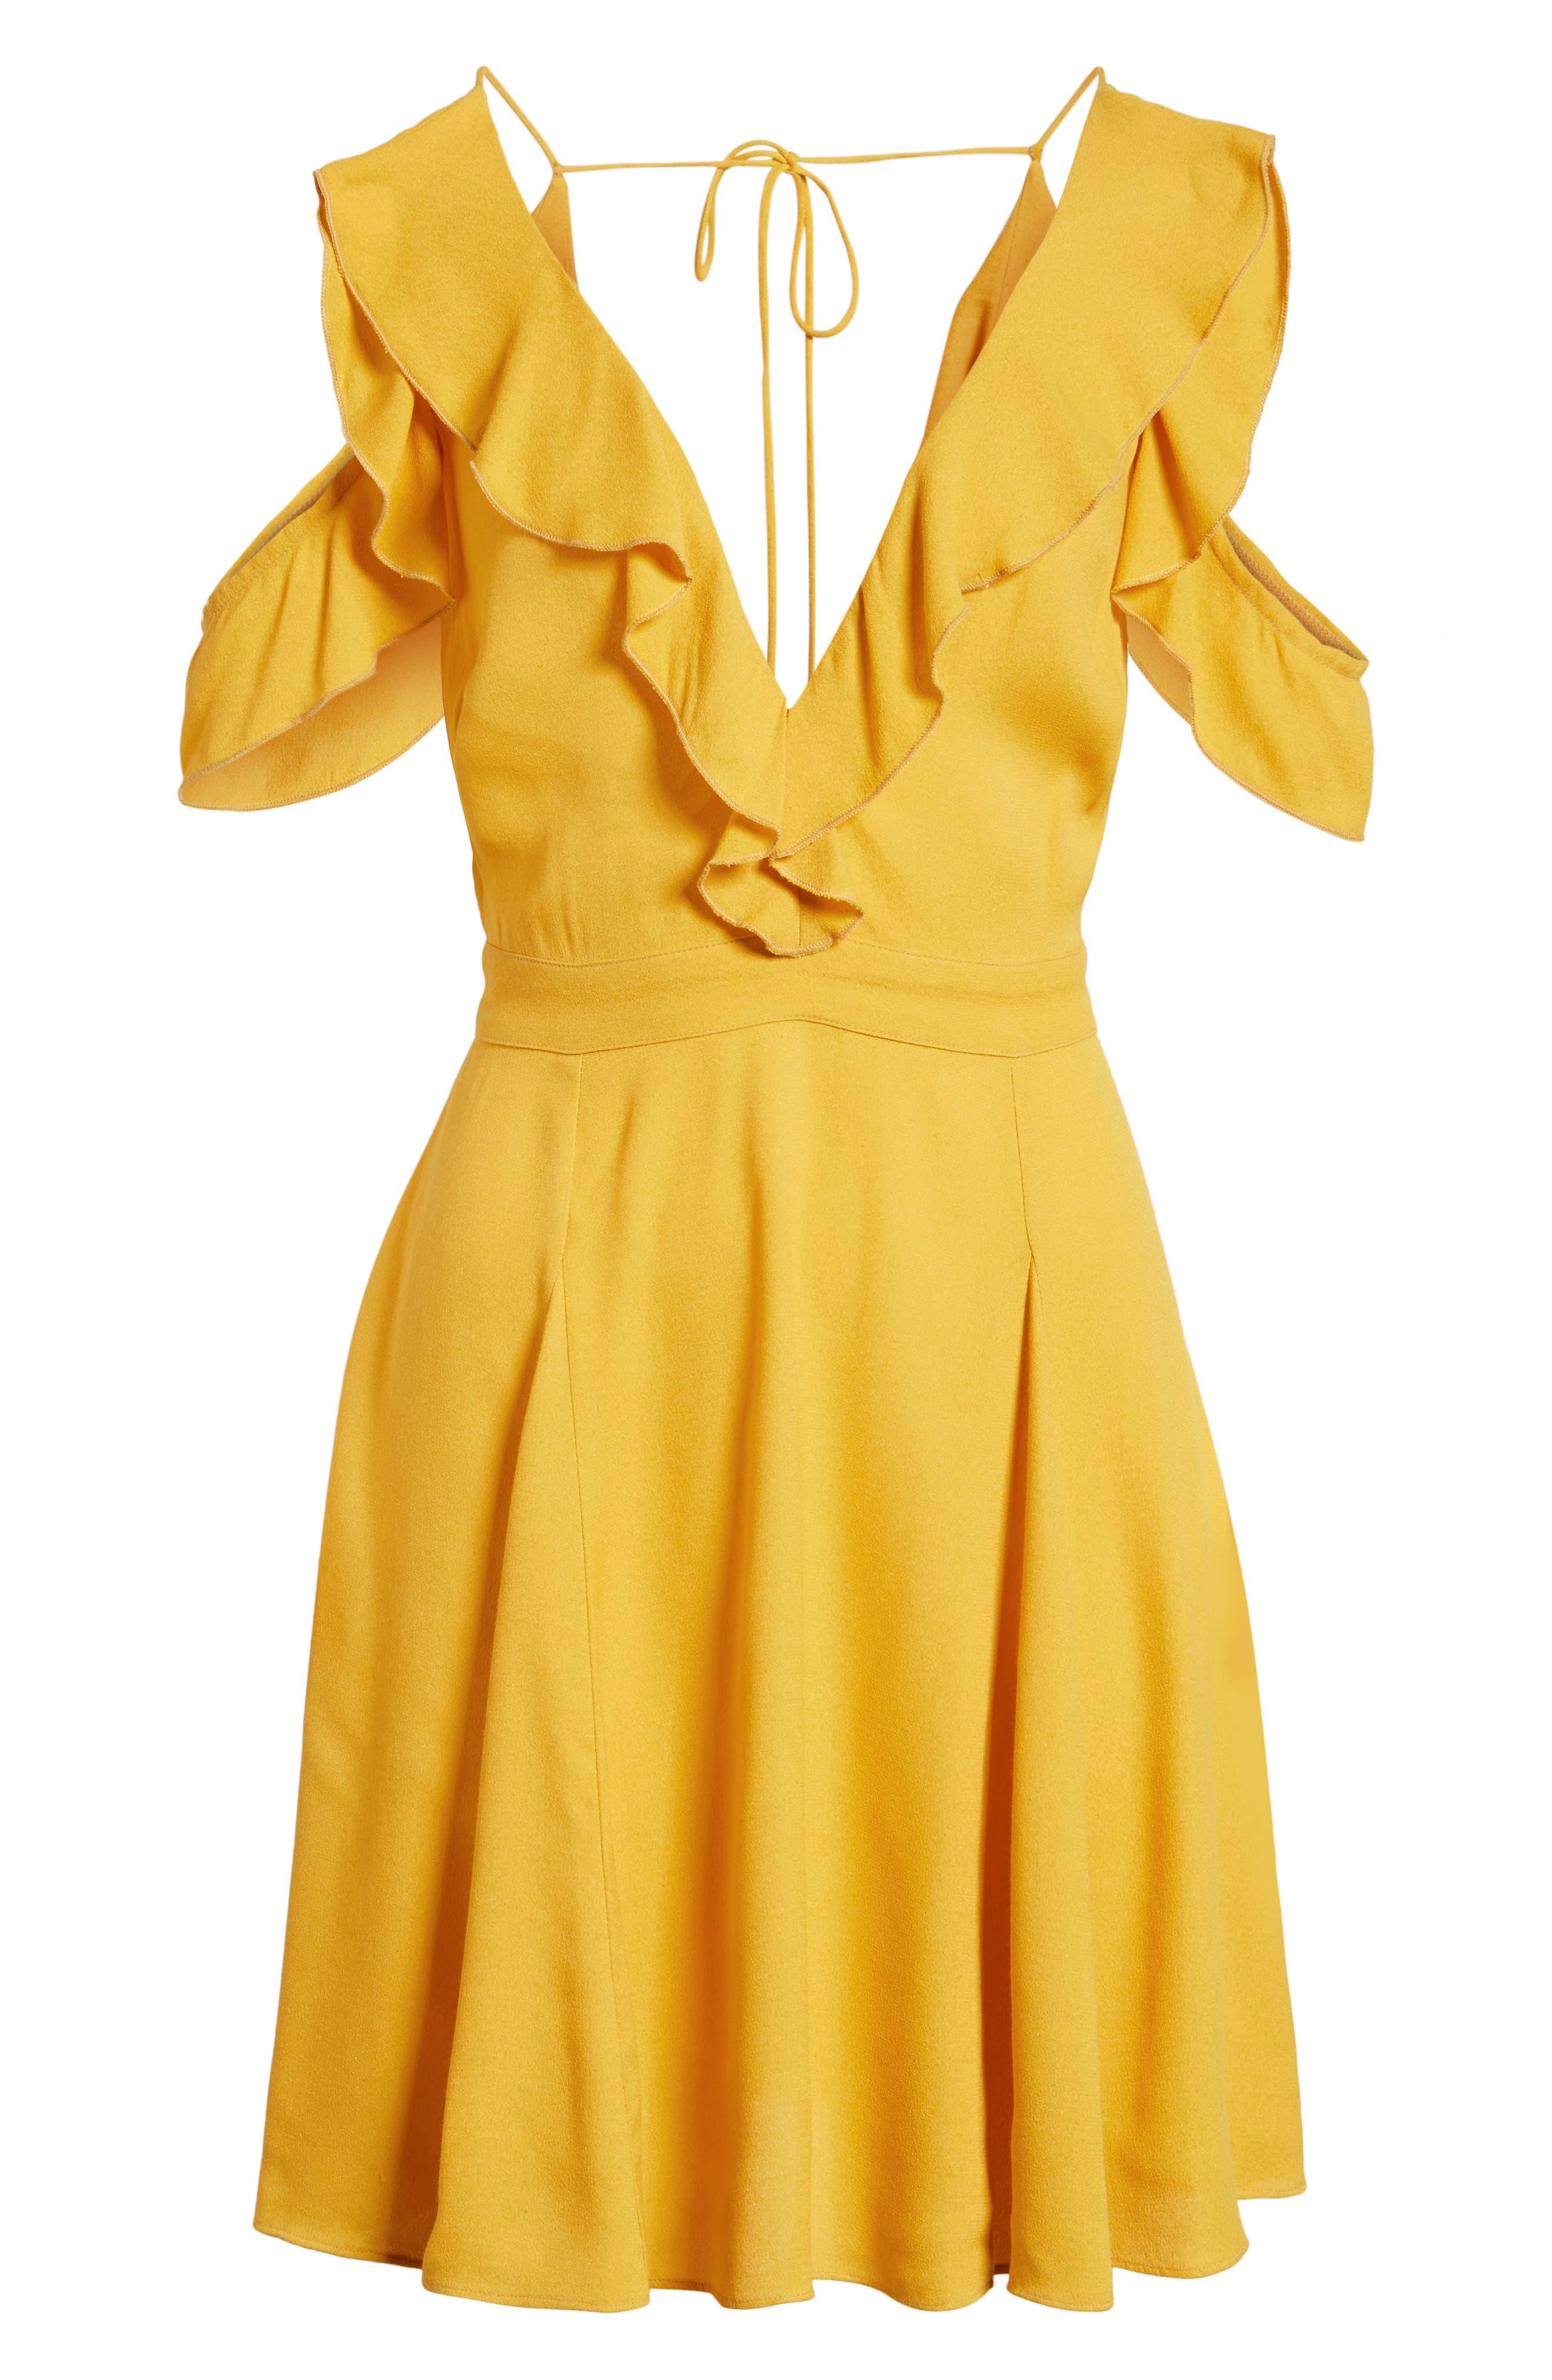 Enzo Cold Shoulder Fit & Flare Dress,                             Alternate thumbnail 7, color,